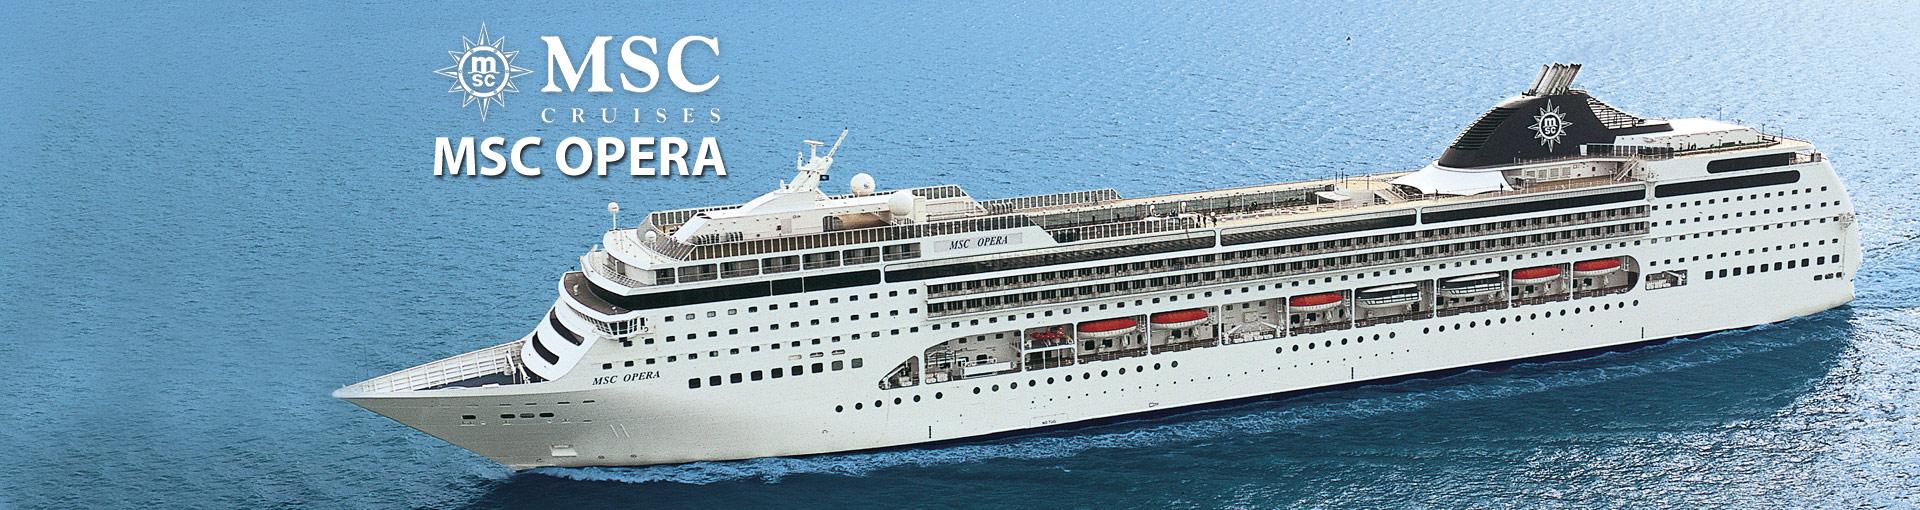 Msc Opera Cruise Ship 2018 And 2019 Msc Opera